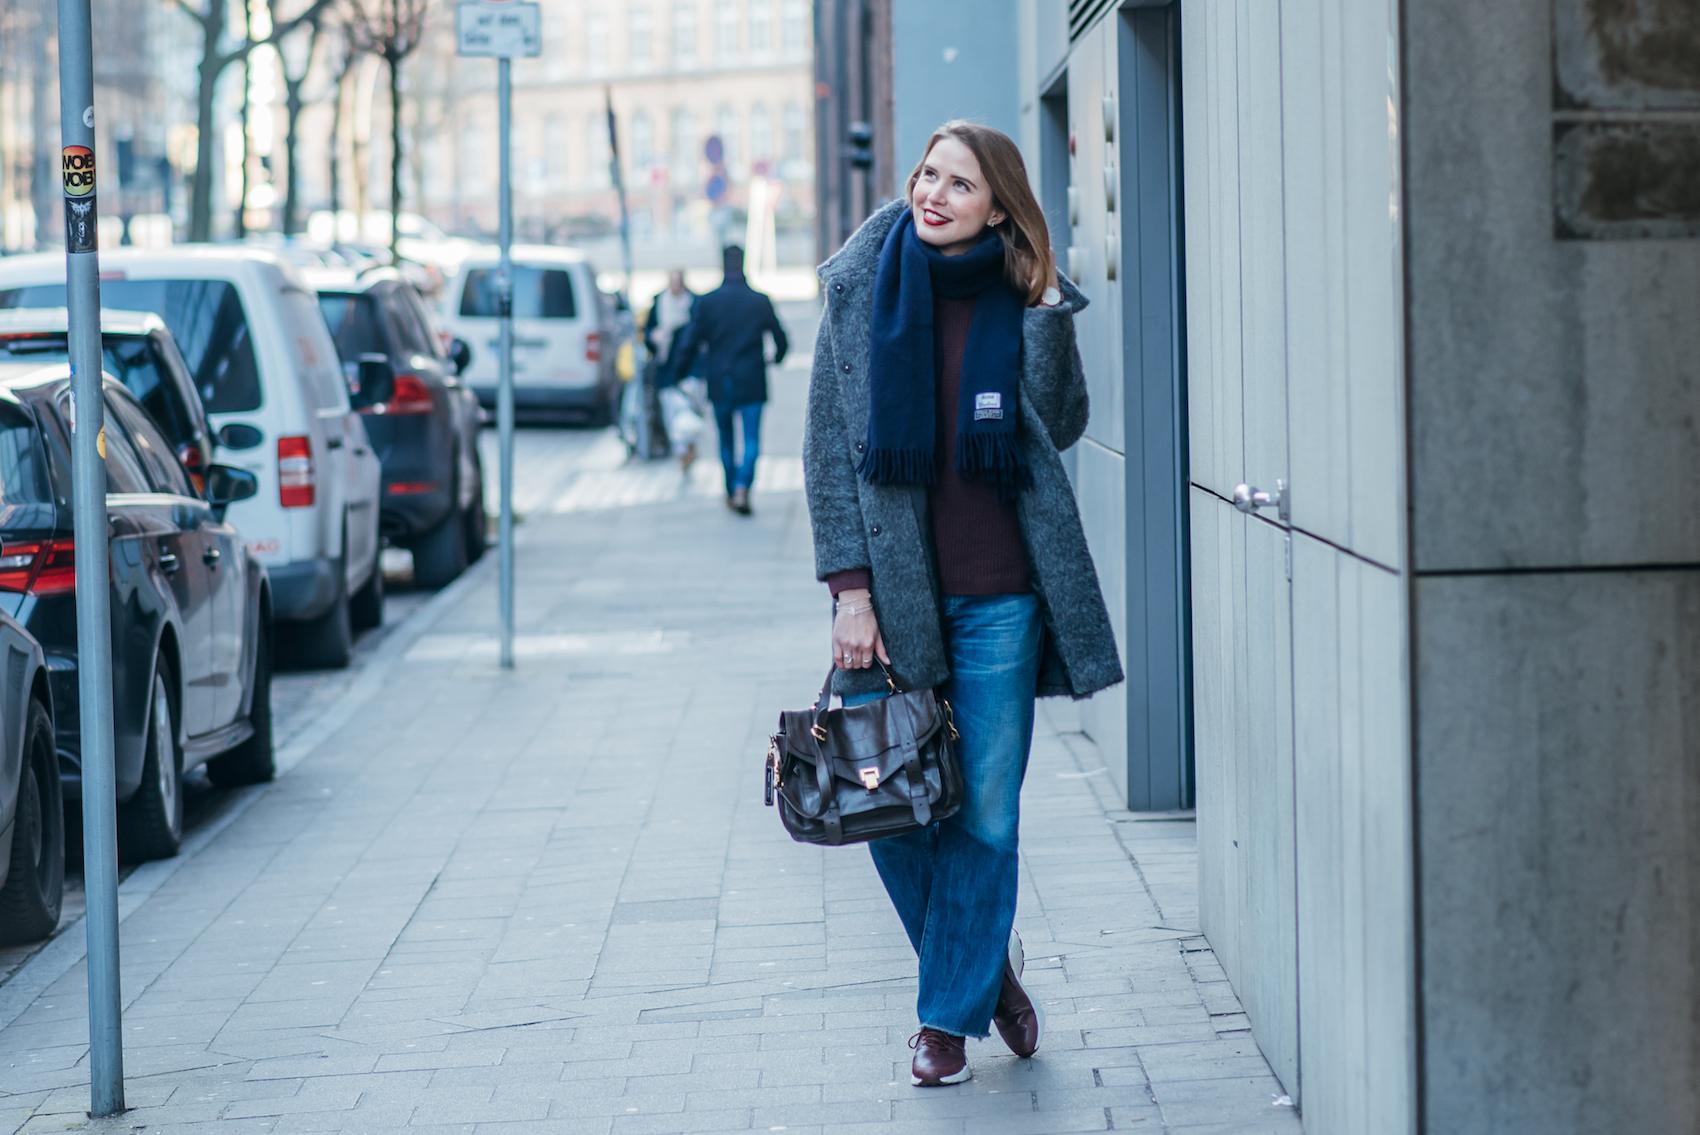 suelovesnyc_susan_fengler_hamburg_schlaghose_und_sneaker_im_winter_kombinieren